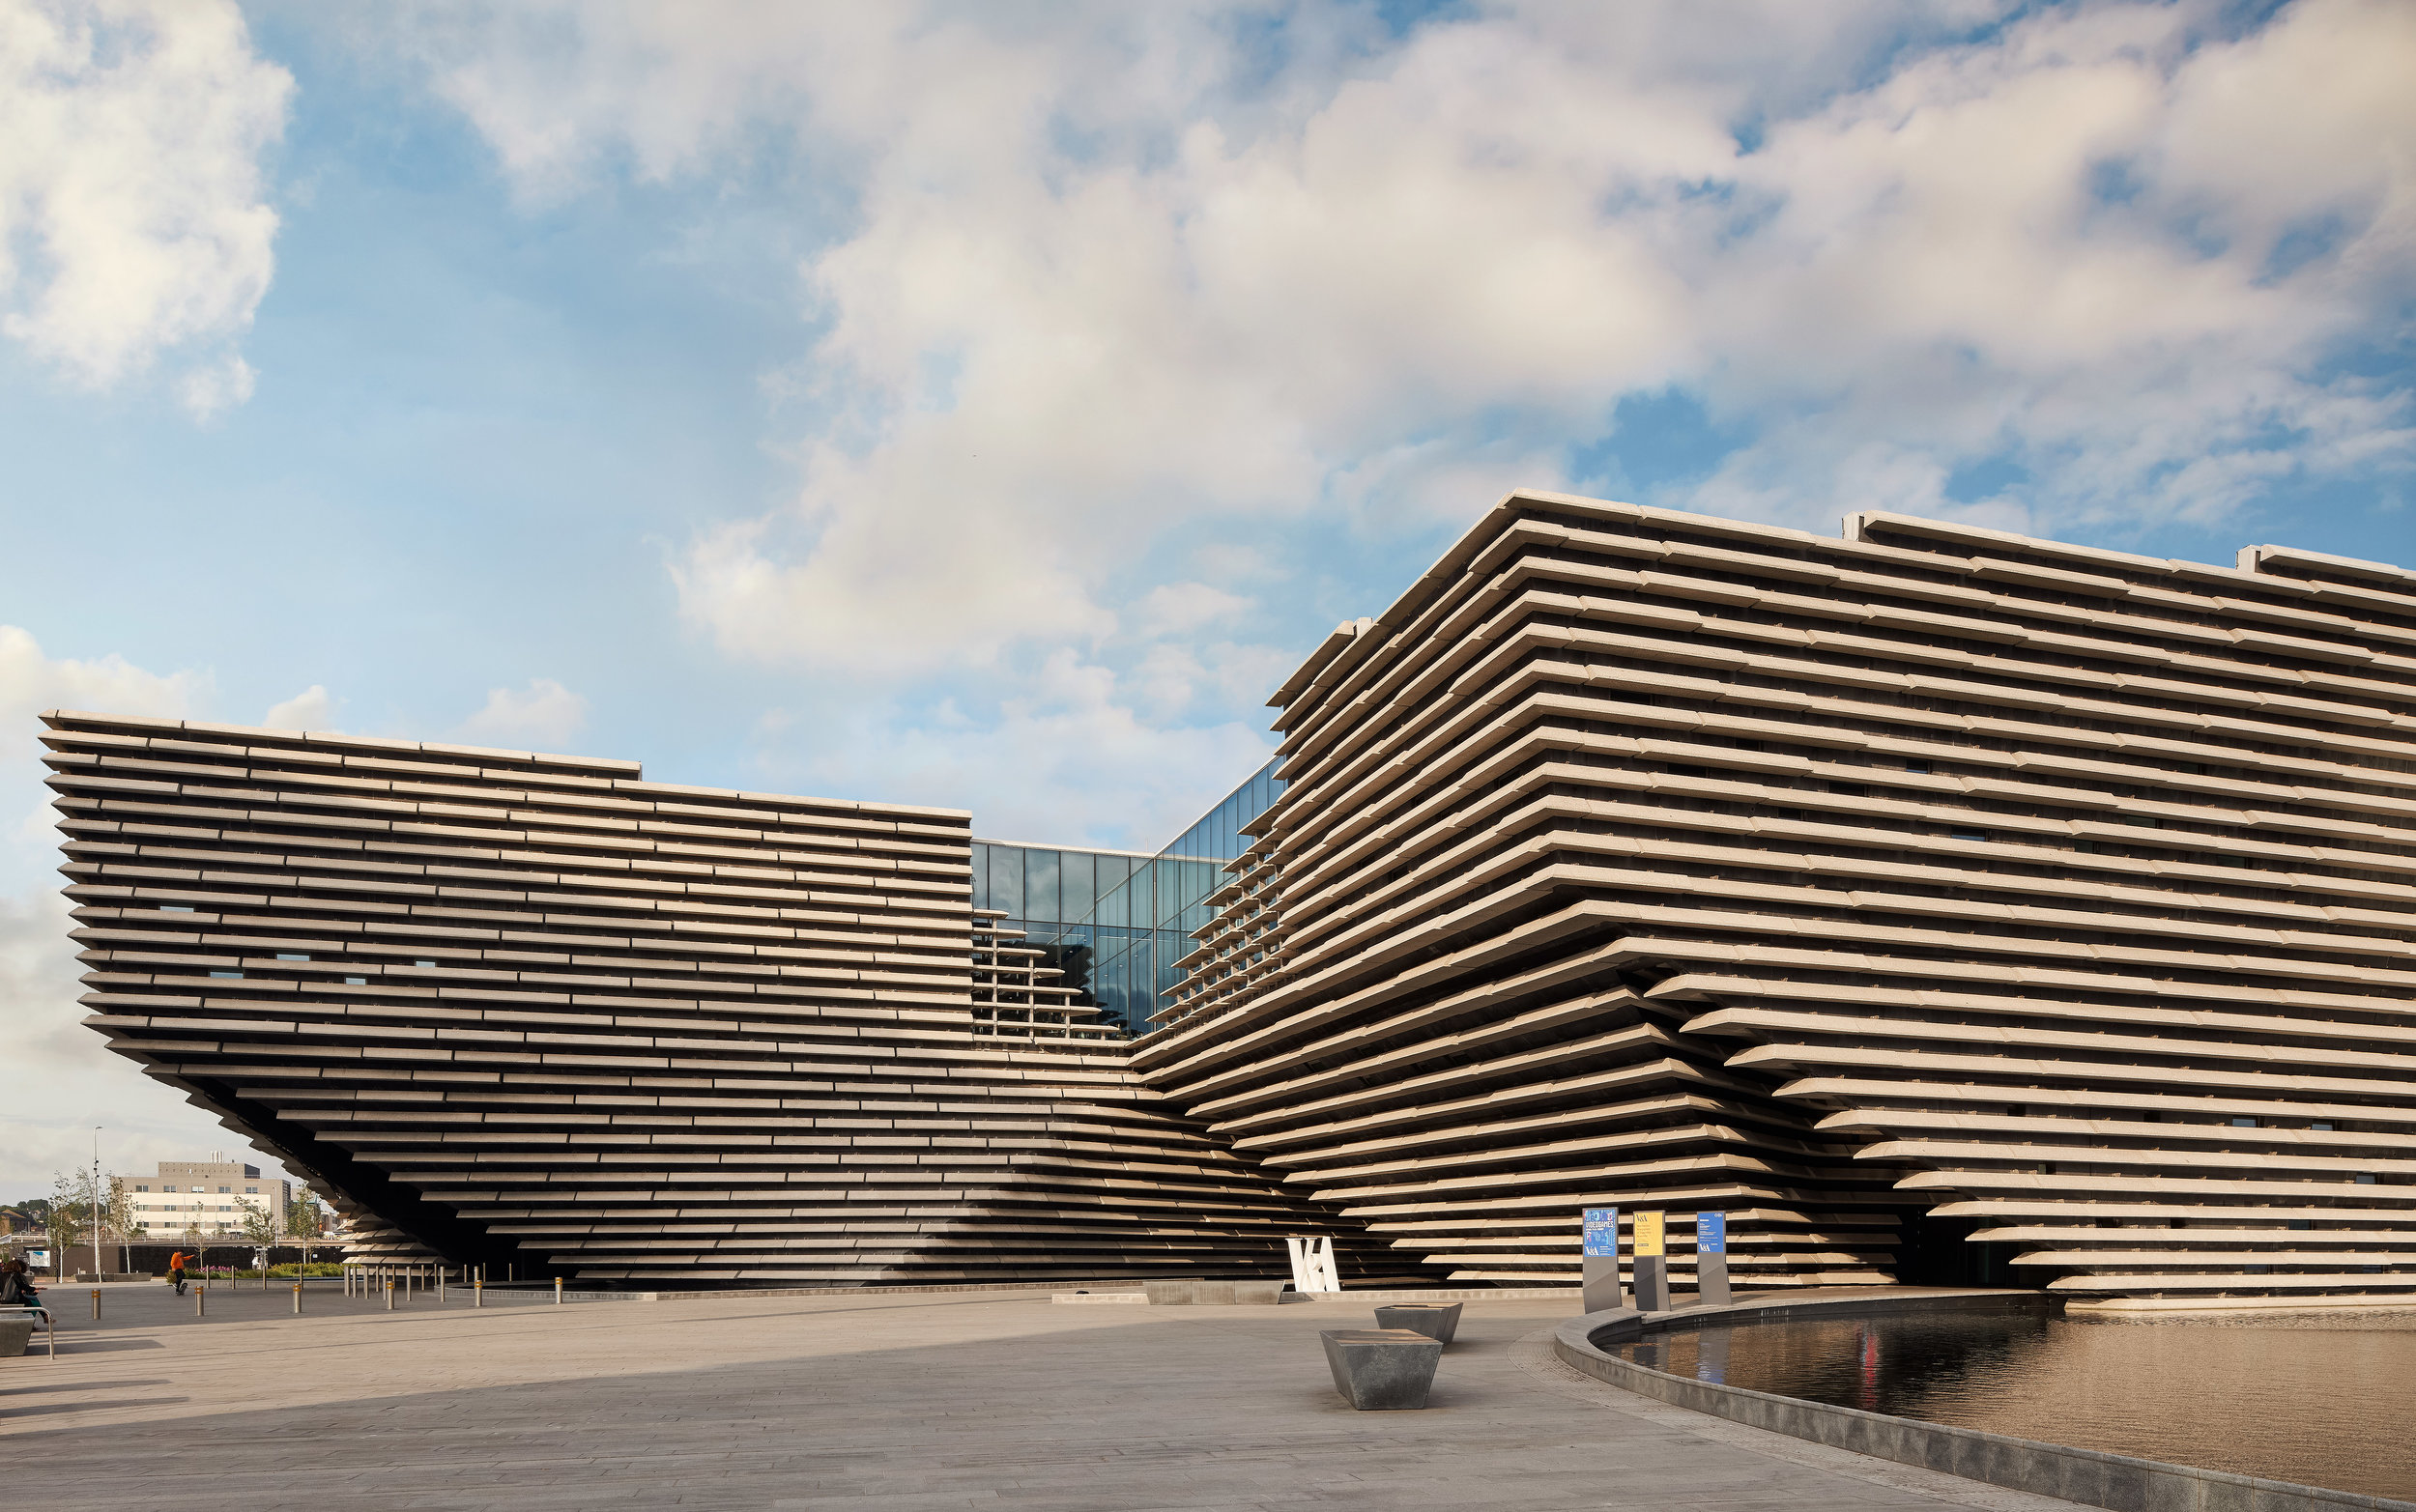 V & A Museum of Design: Dundee, U.K.